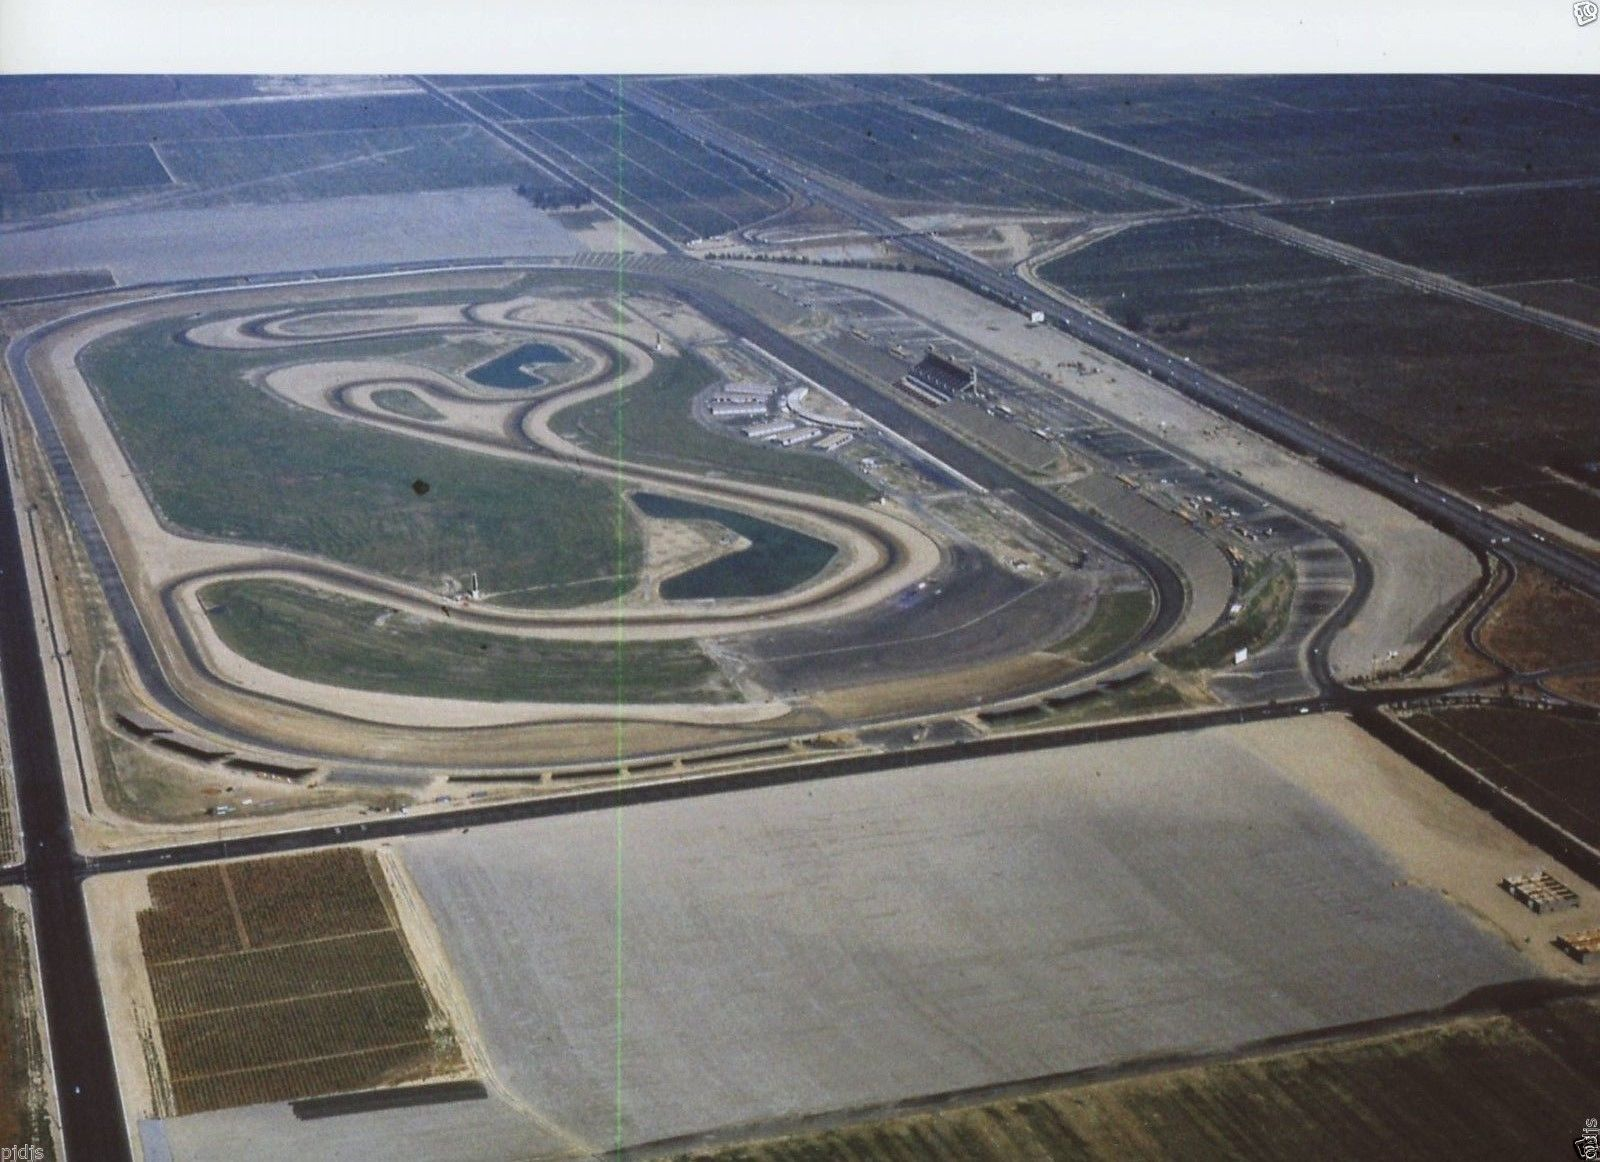 Ontario motor speedway indy f 5000 pinterest race for Ontario motor speedway california